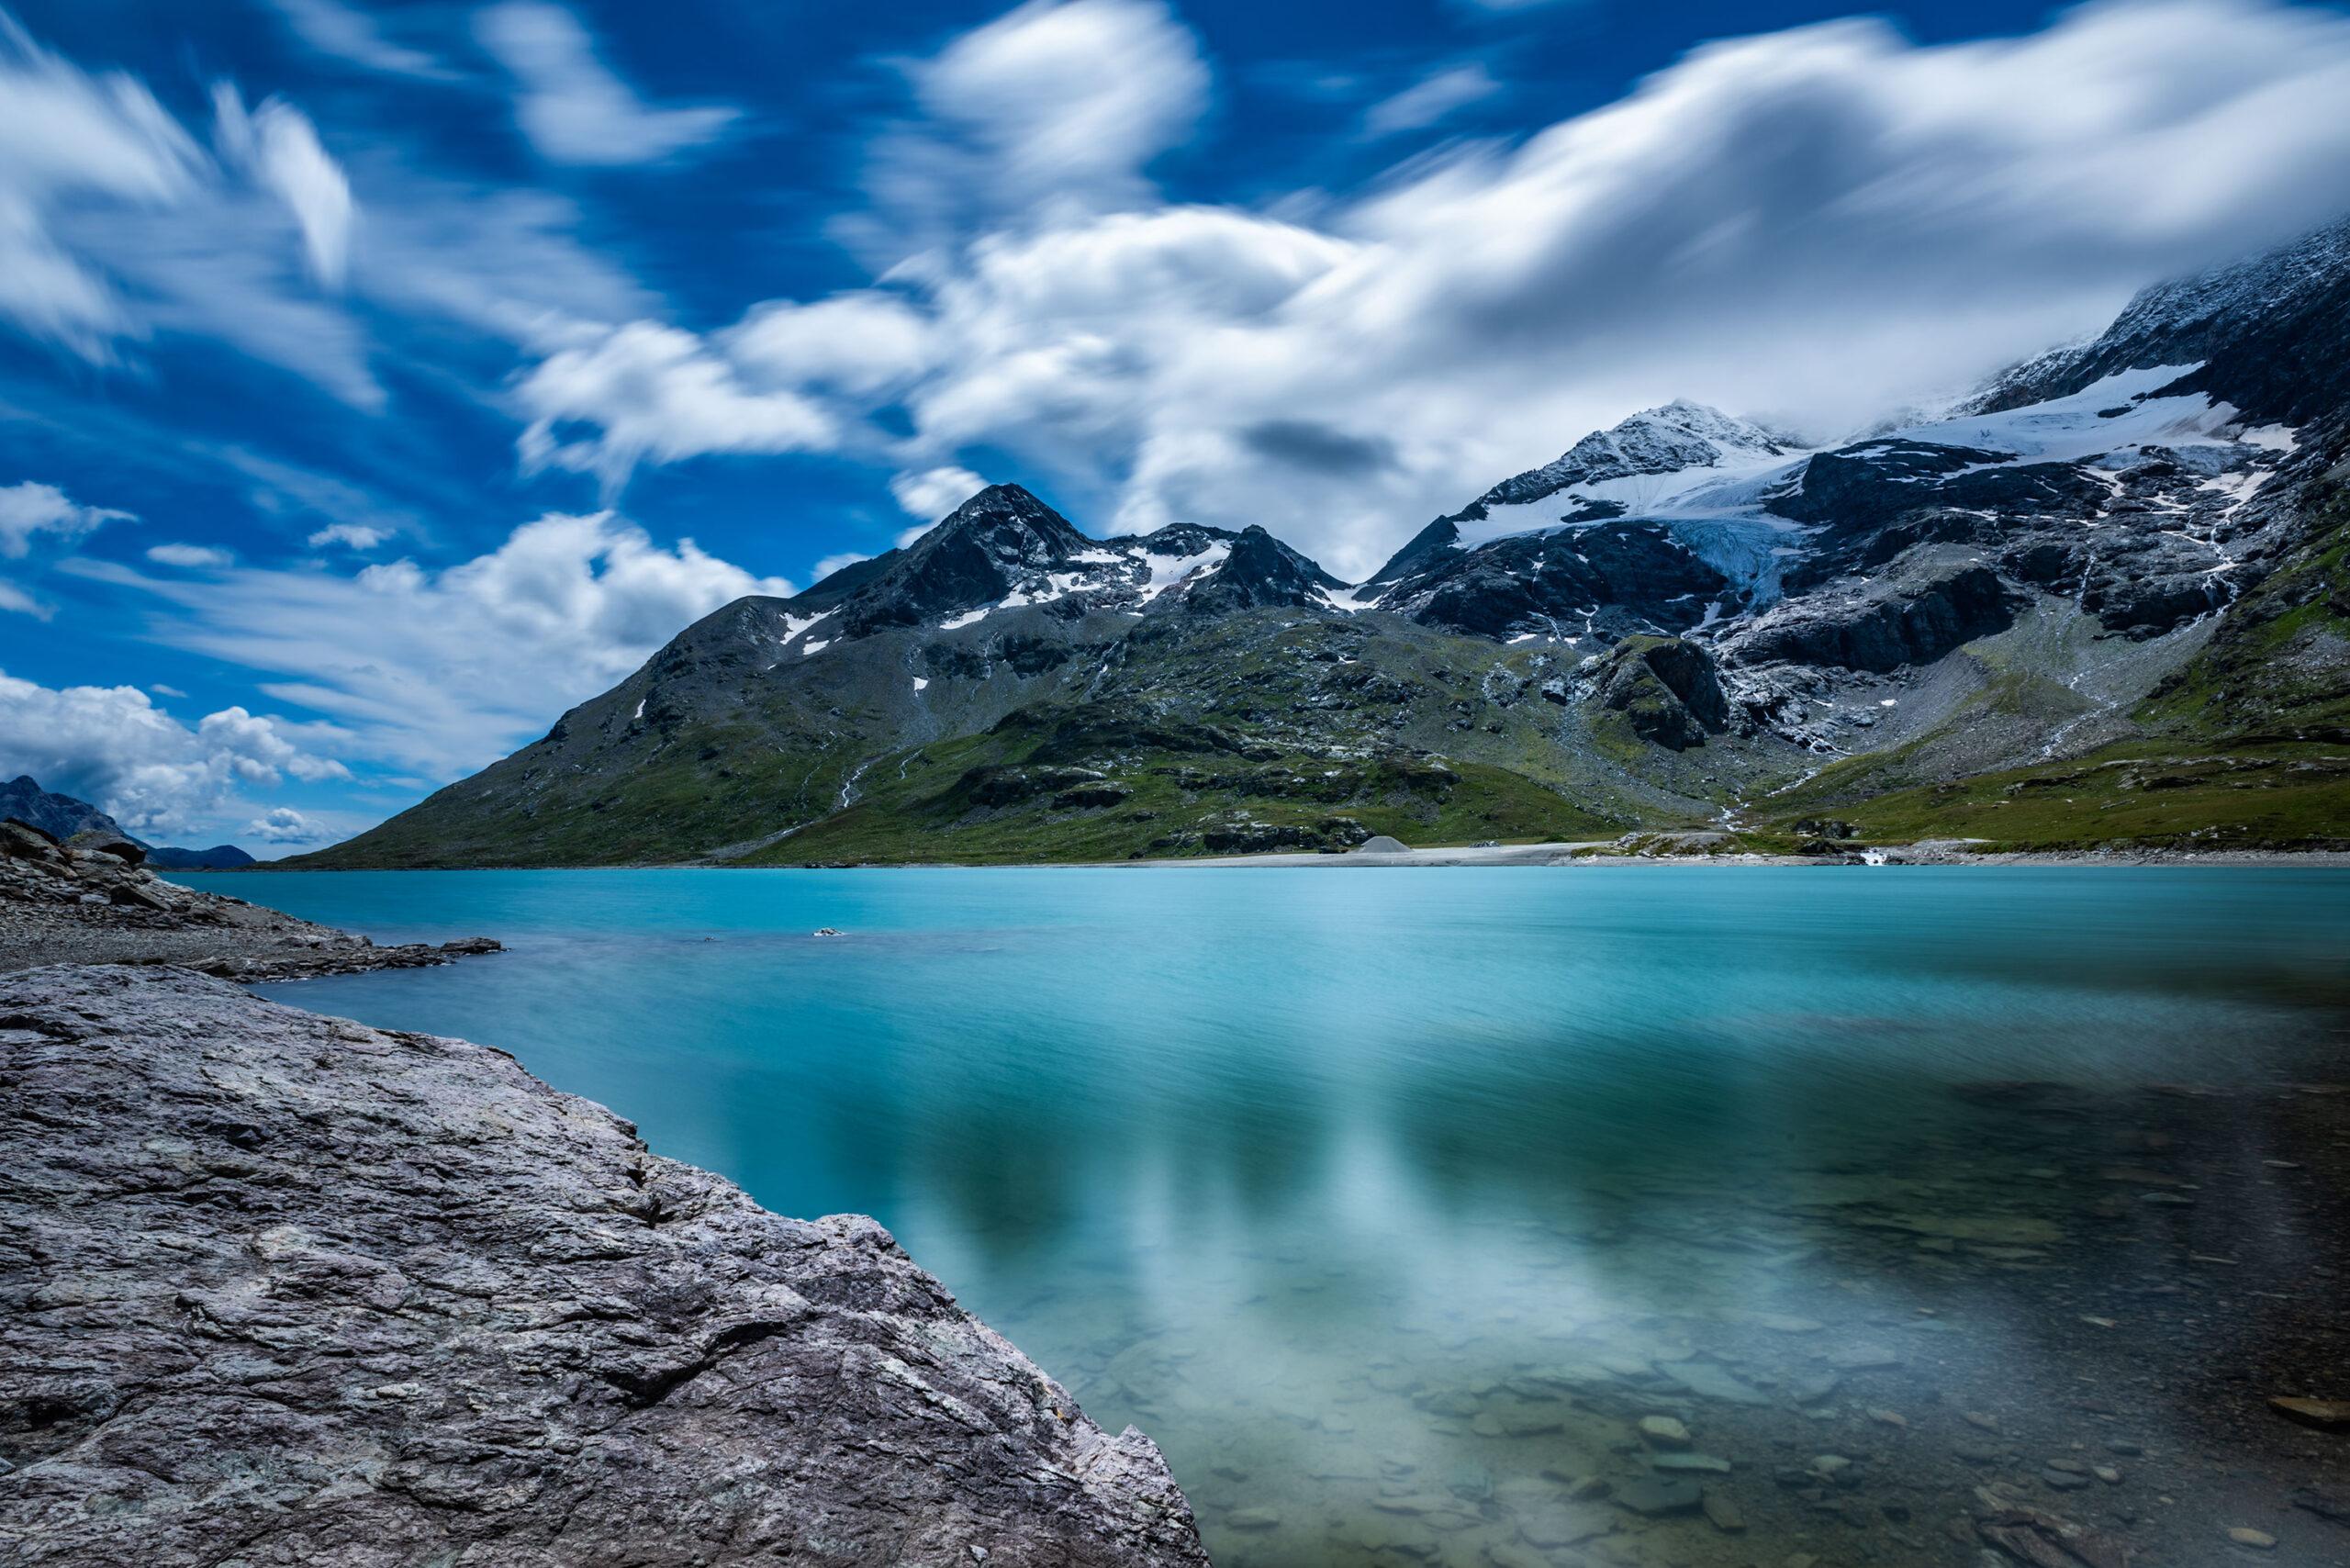 Fine art and landscape photography of the Lago Bianco in Graubünden, Switzerland. Image by Jennifer Esseiva.